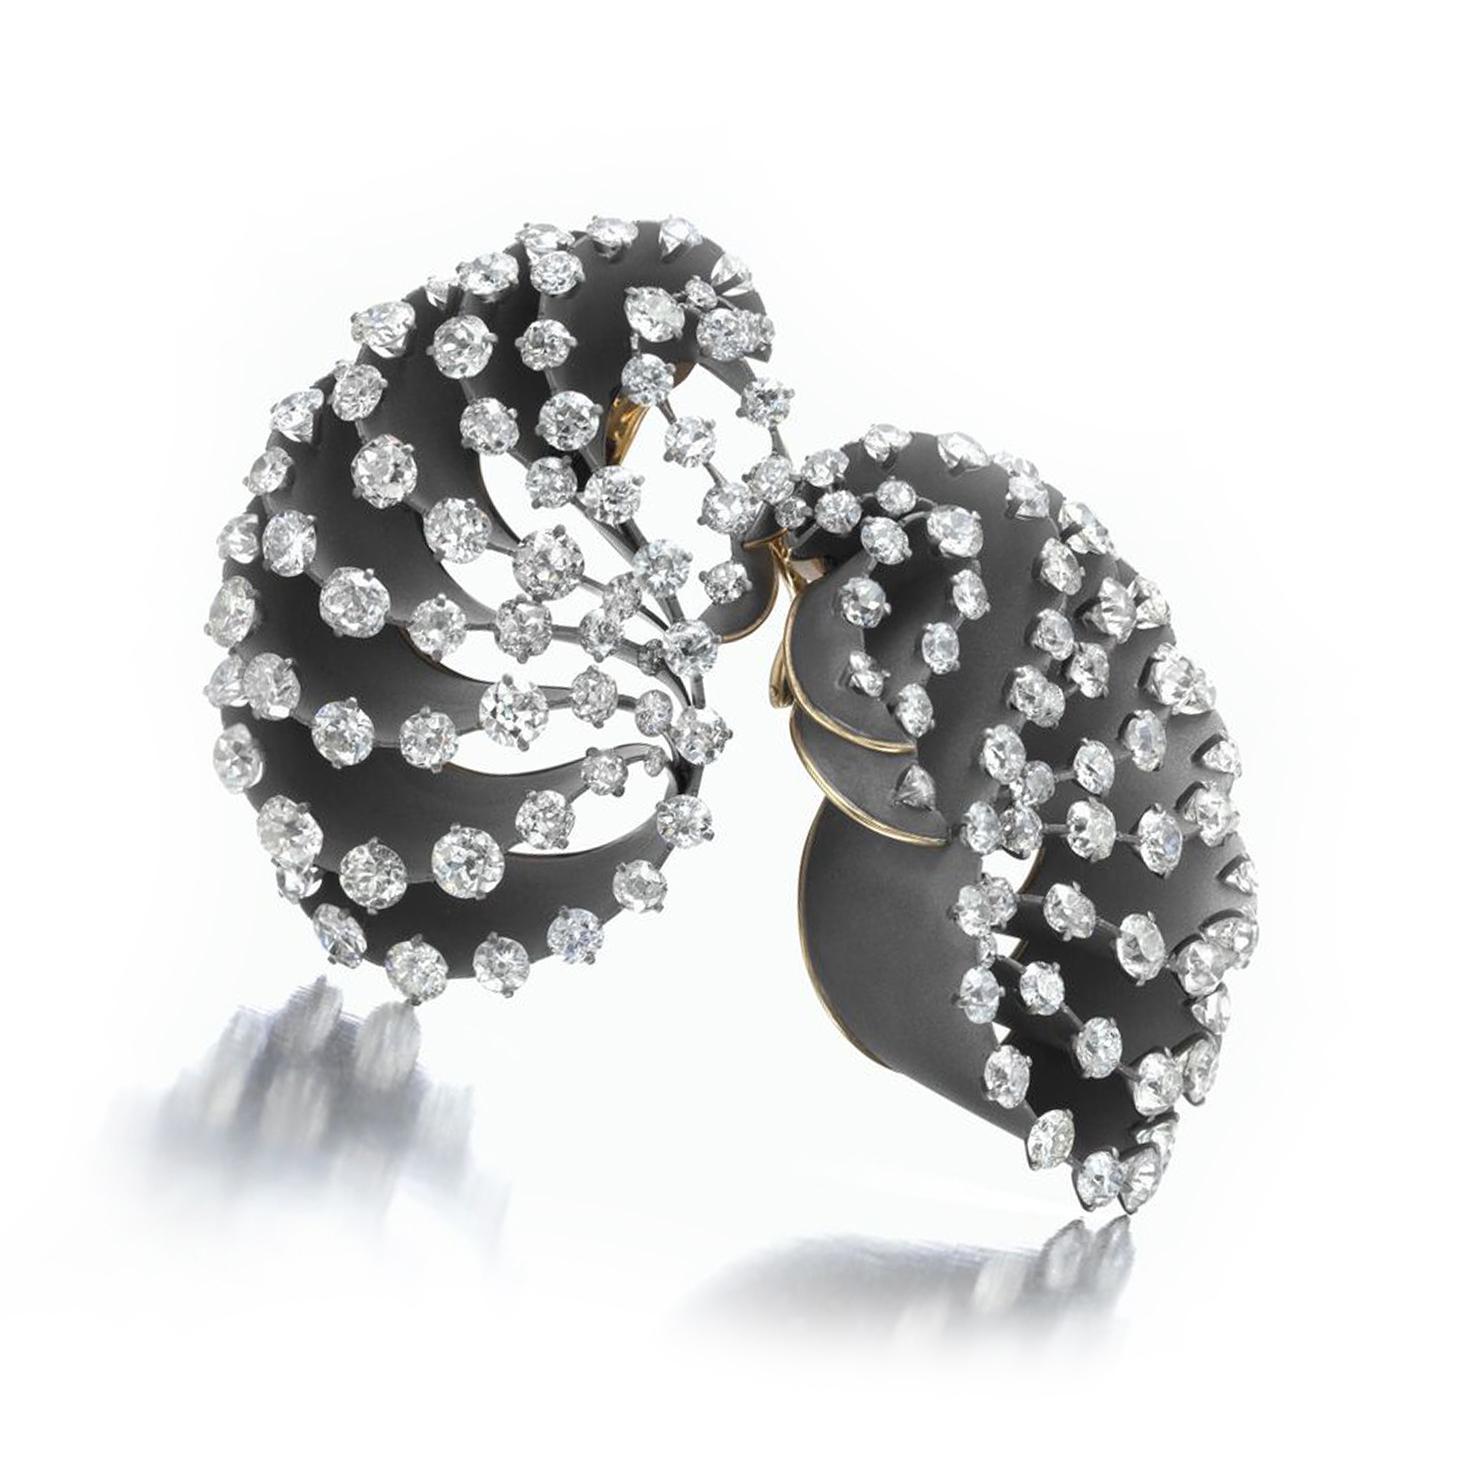 A Pair of Titanium and Diamond Ear Clips, by SABBA